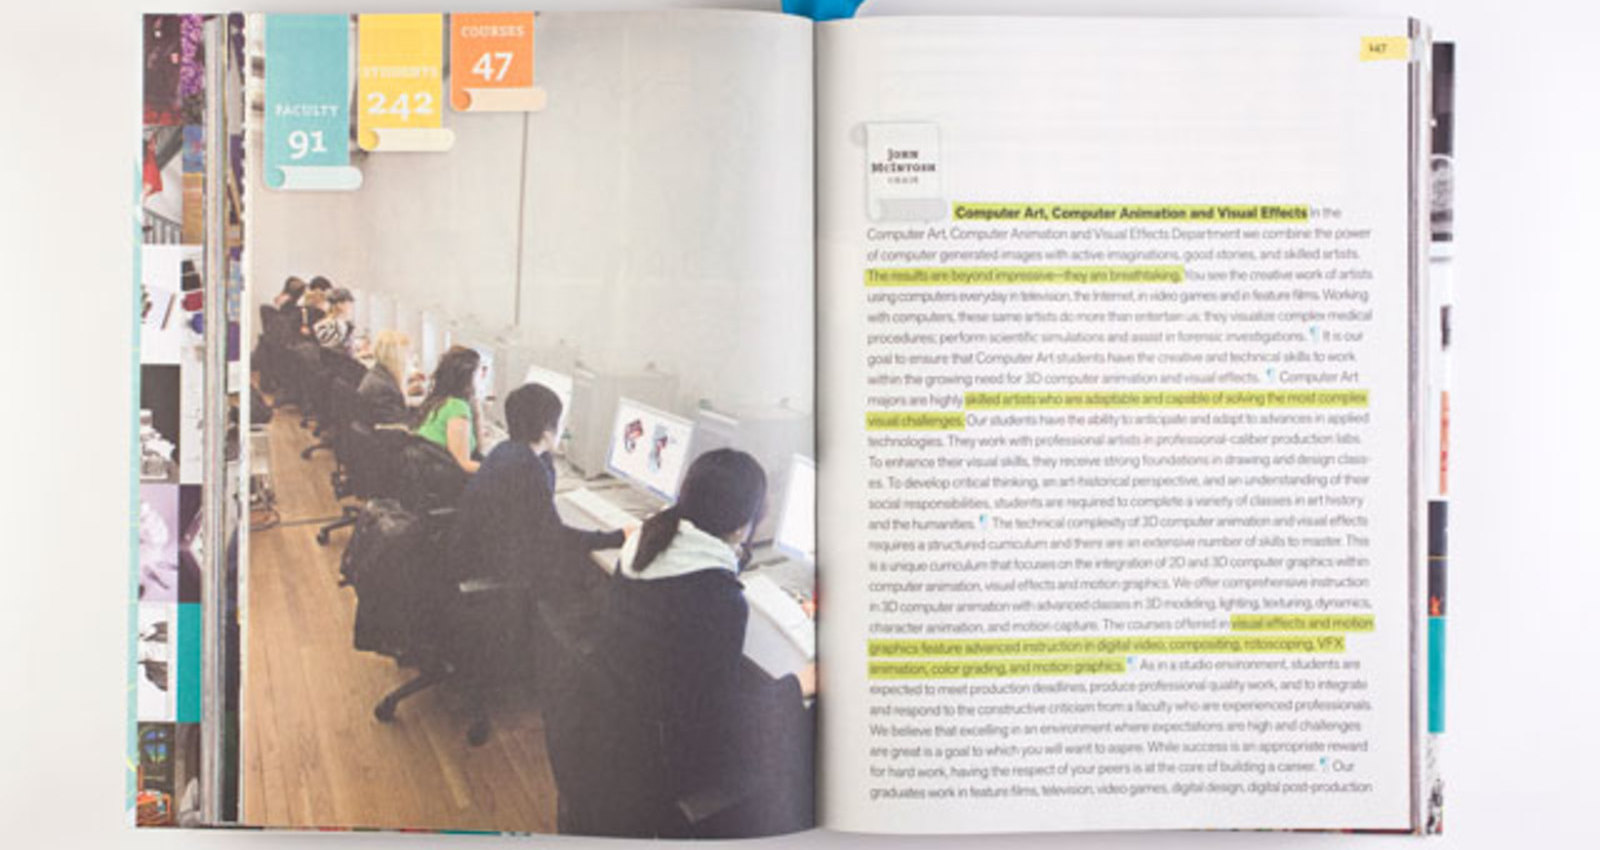 SVA Undergraduate Catalog 2011/12